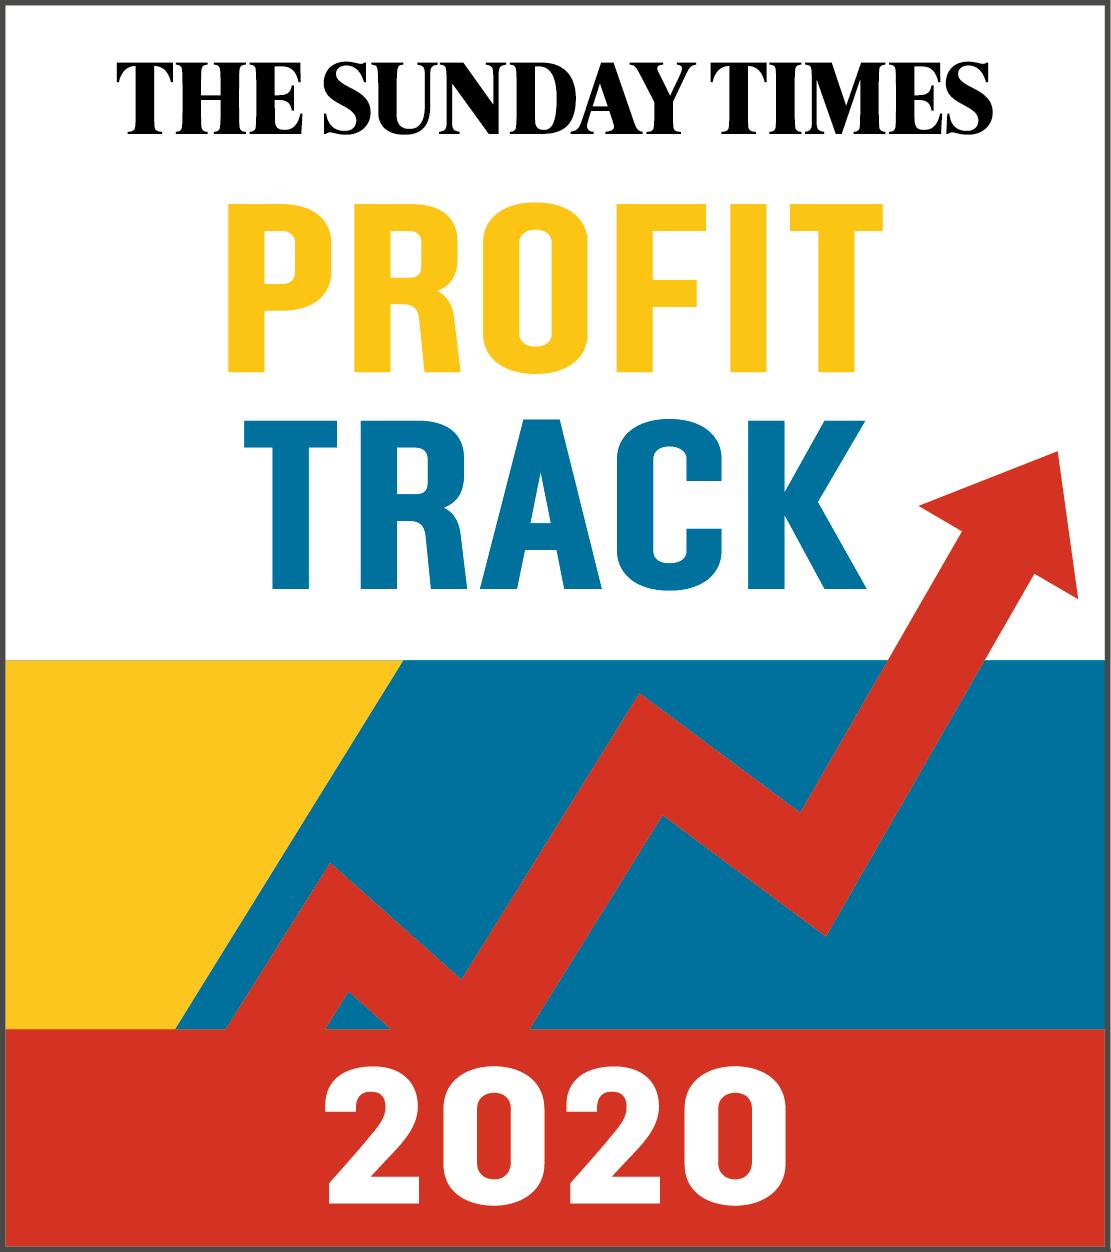 The Sunday Times Profit Track 100